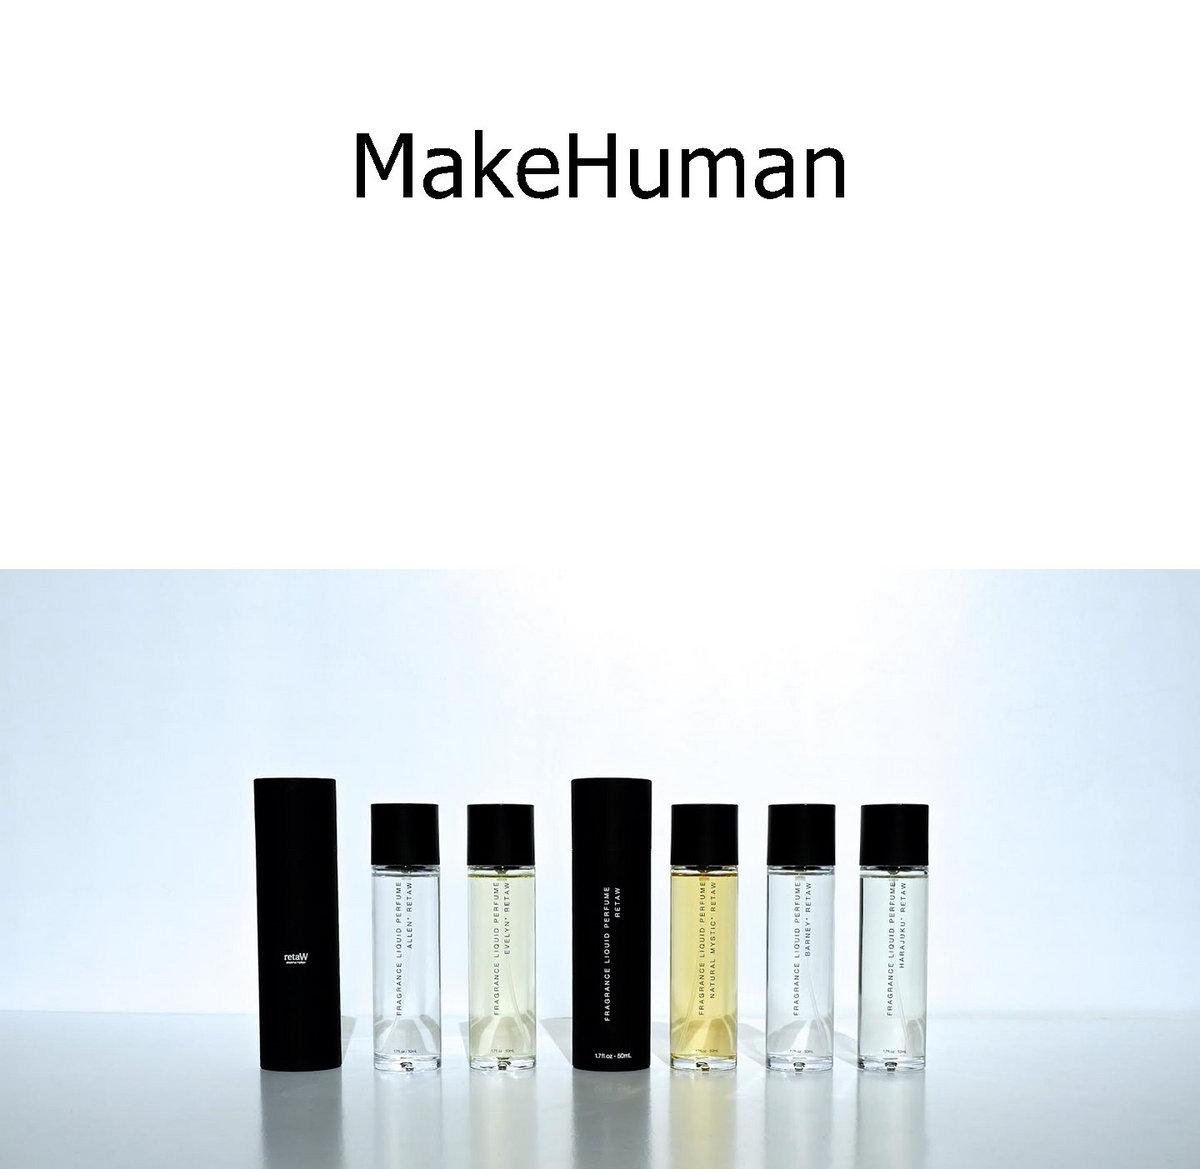 on iMac Pro how install v 1 1 0 MakeHuman